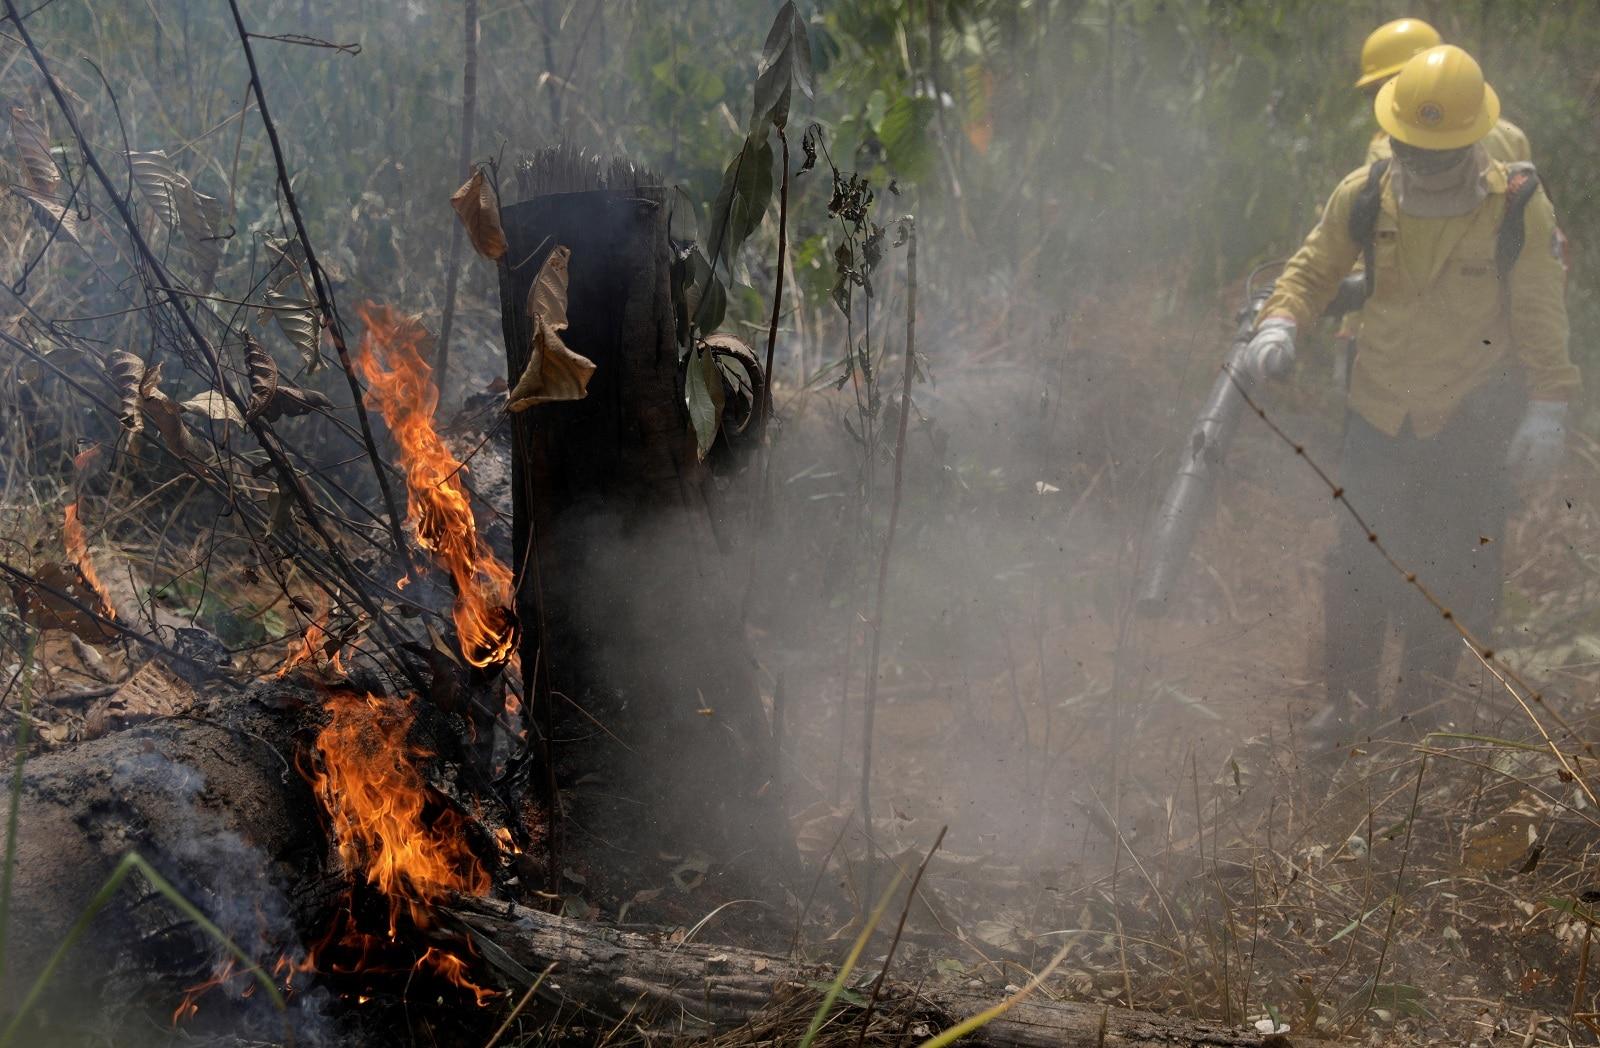 Firefighters extinguish a fire in Amazon jungle in Porto Velho, Brazil August 25, 2019. REUTERS/Ricardo Moraes